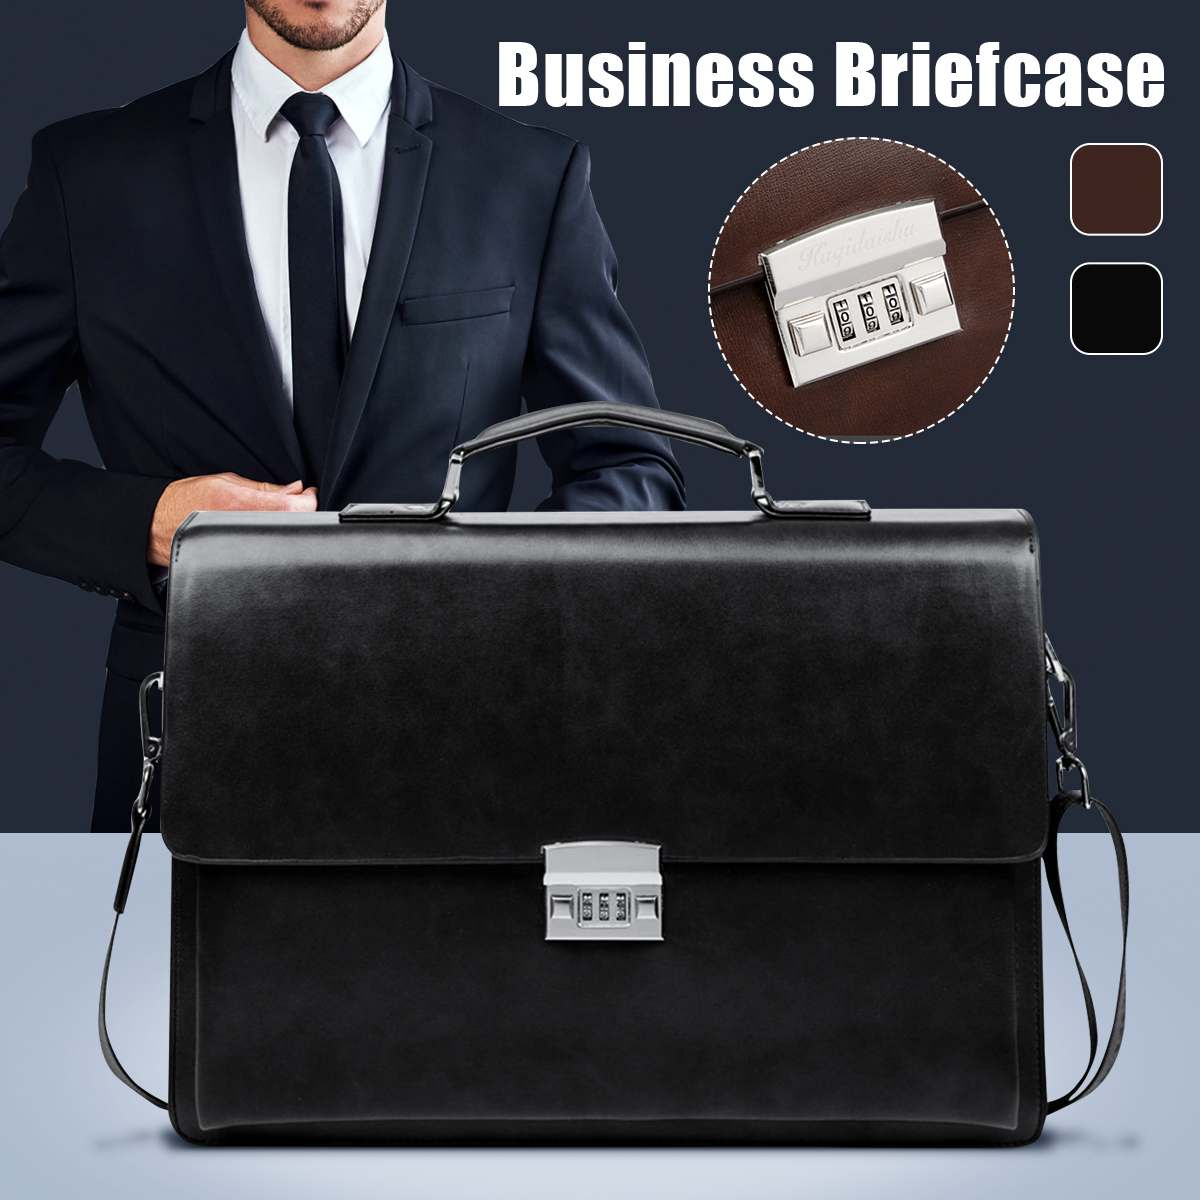 Men's Leather Briefcase Bag Fashion British Style Business Bags For Men Laptop Bag Shoulder Bags Male Luxury Handbag With Lock